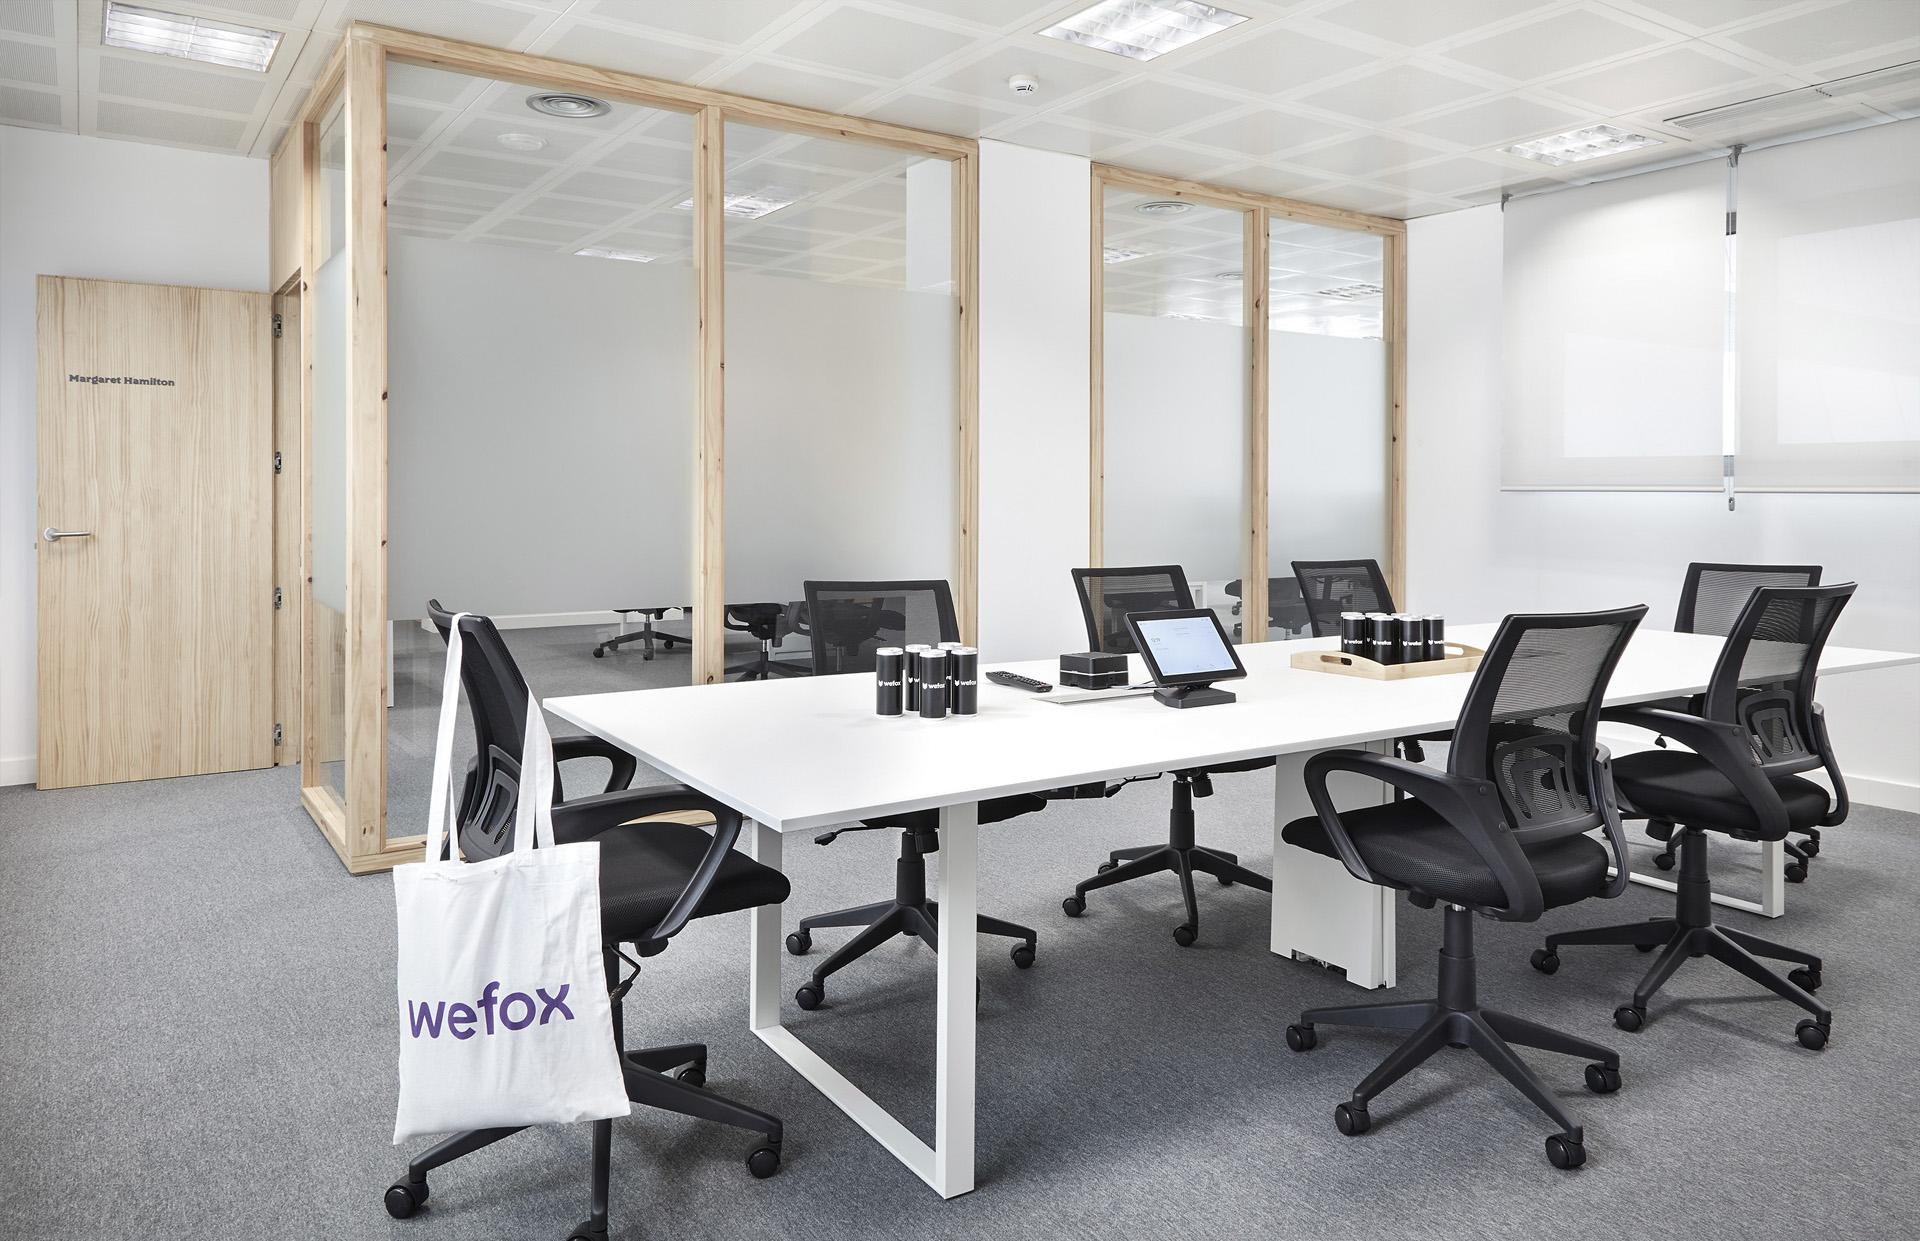 WEFOX 6